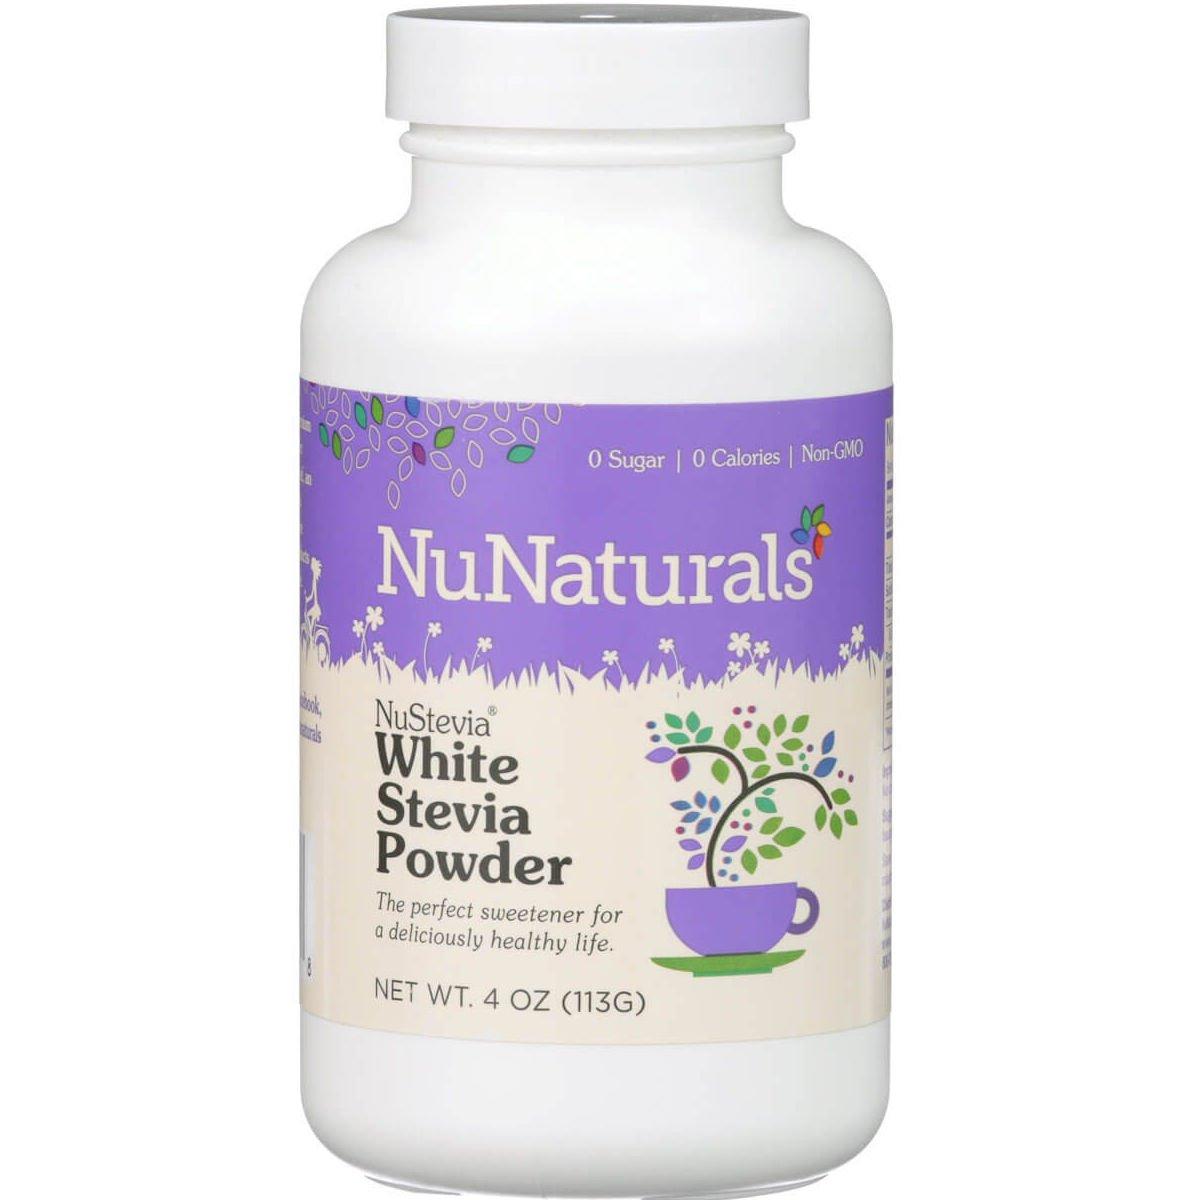 NuNaturals – NuStevia – White Stevia – All-Purpose Sweetener – 4 Ounce